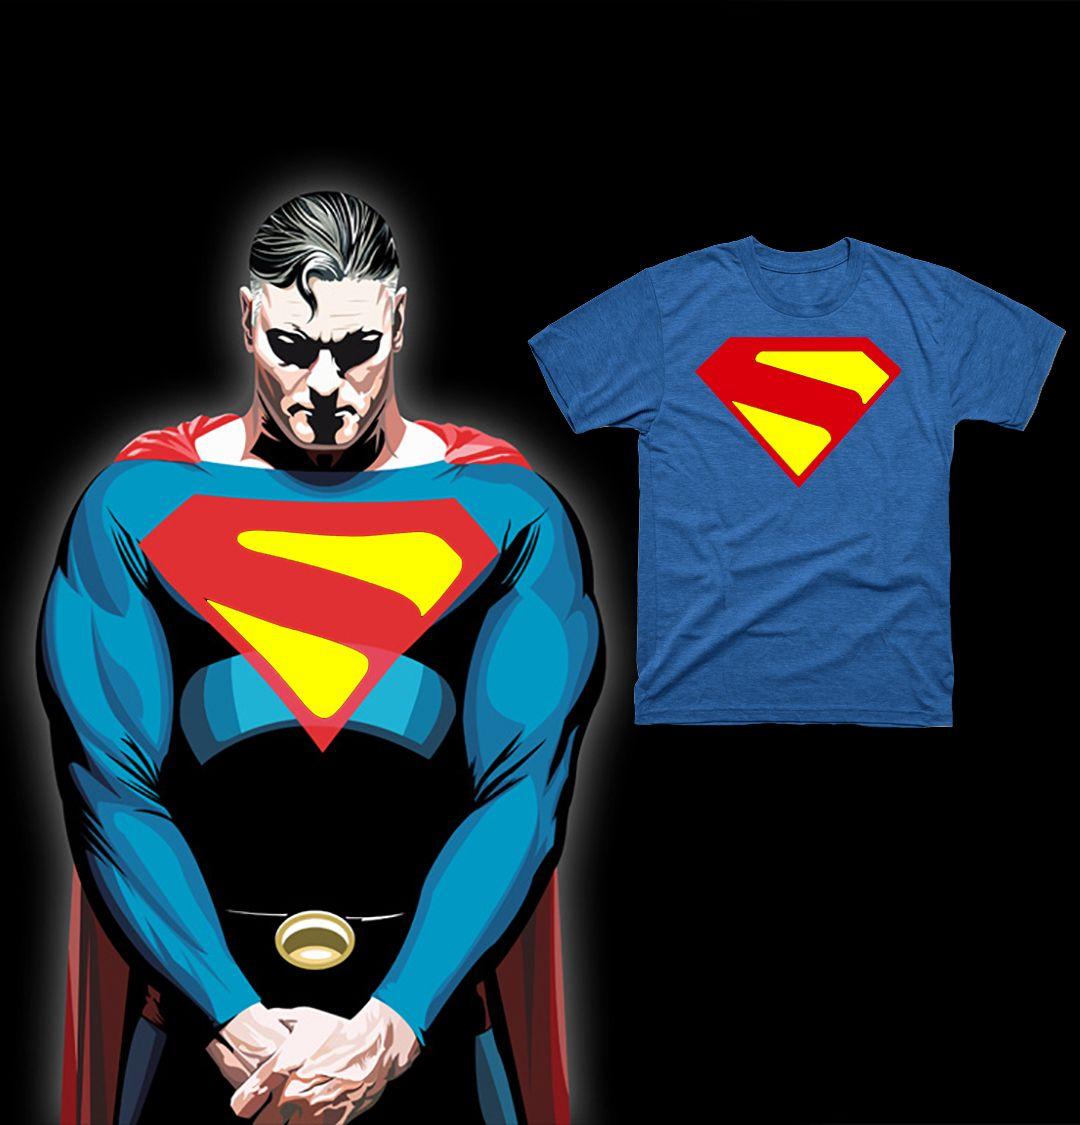 https://www.teepublic.com/t-shirt/484731-evolution-of-superman-kingdom-come?store_id=26069